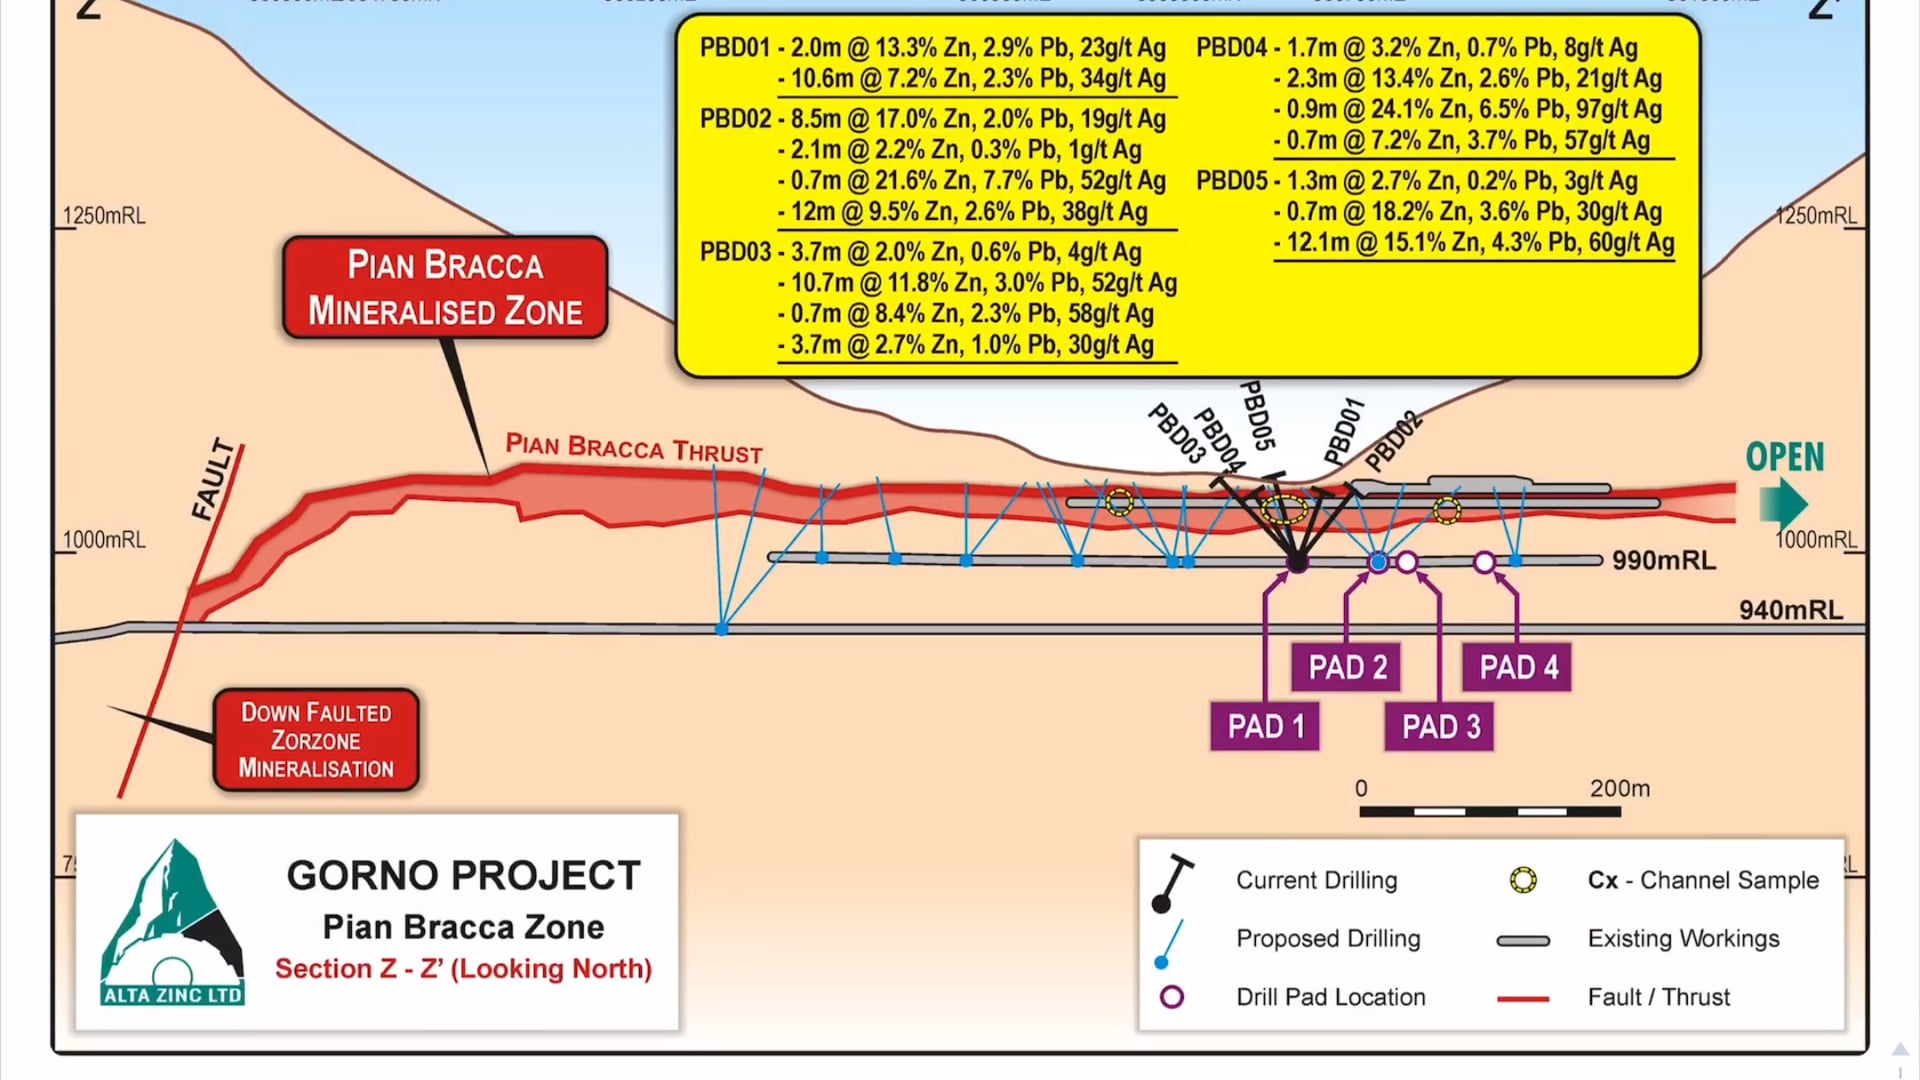 Alta Zinc: Drilling Results Explained - 21 Jan 2020